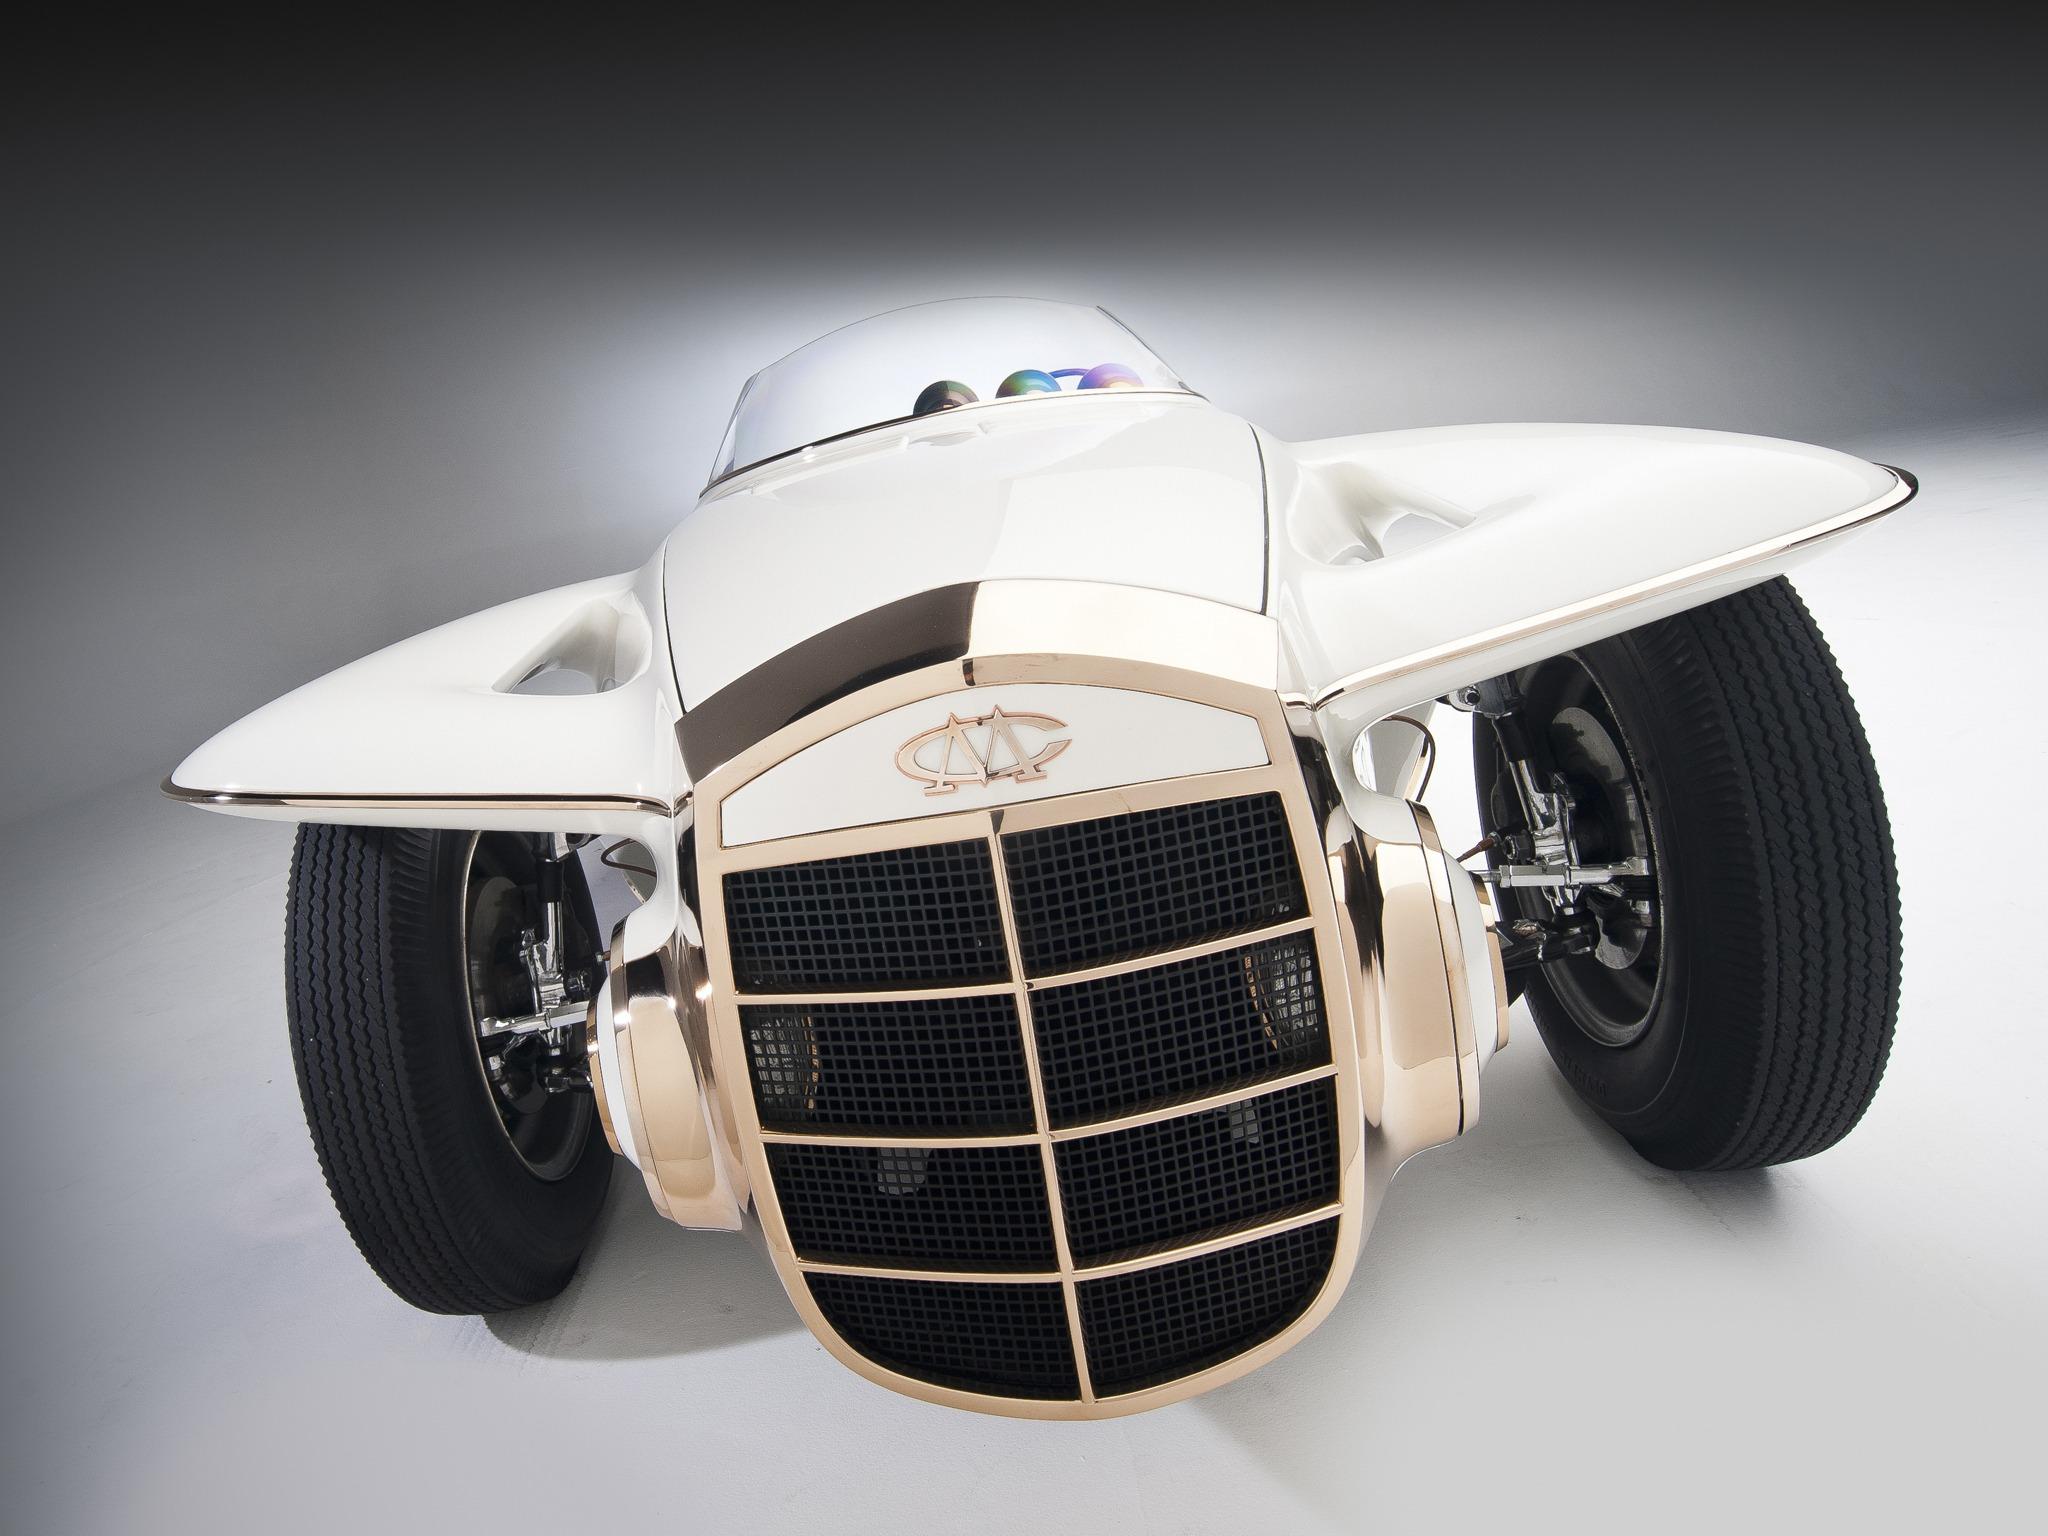 1965_Mercer_Cobra_Roadster_by_Virgil_Exner_08